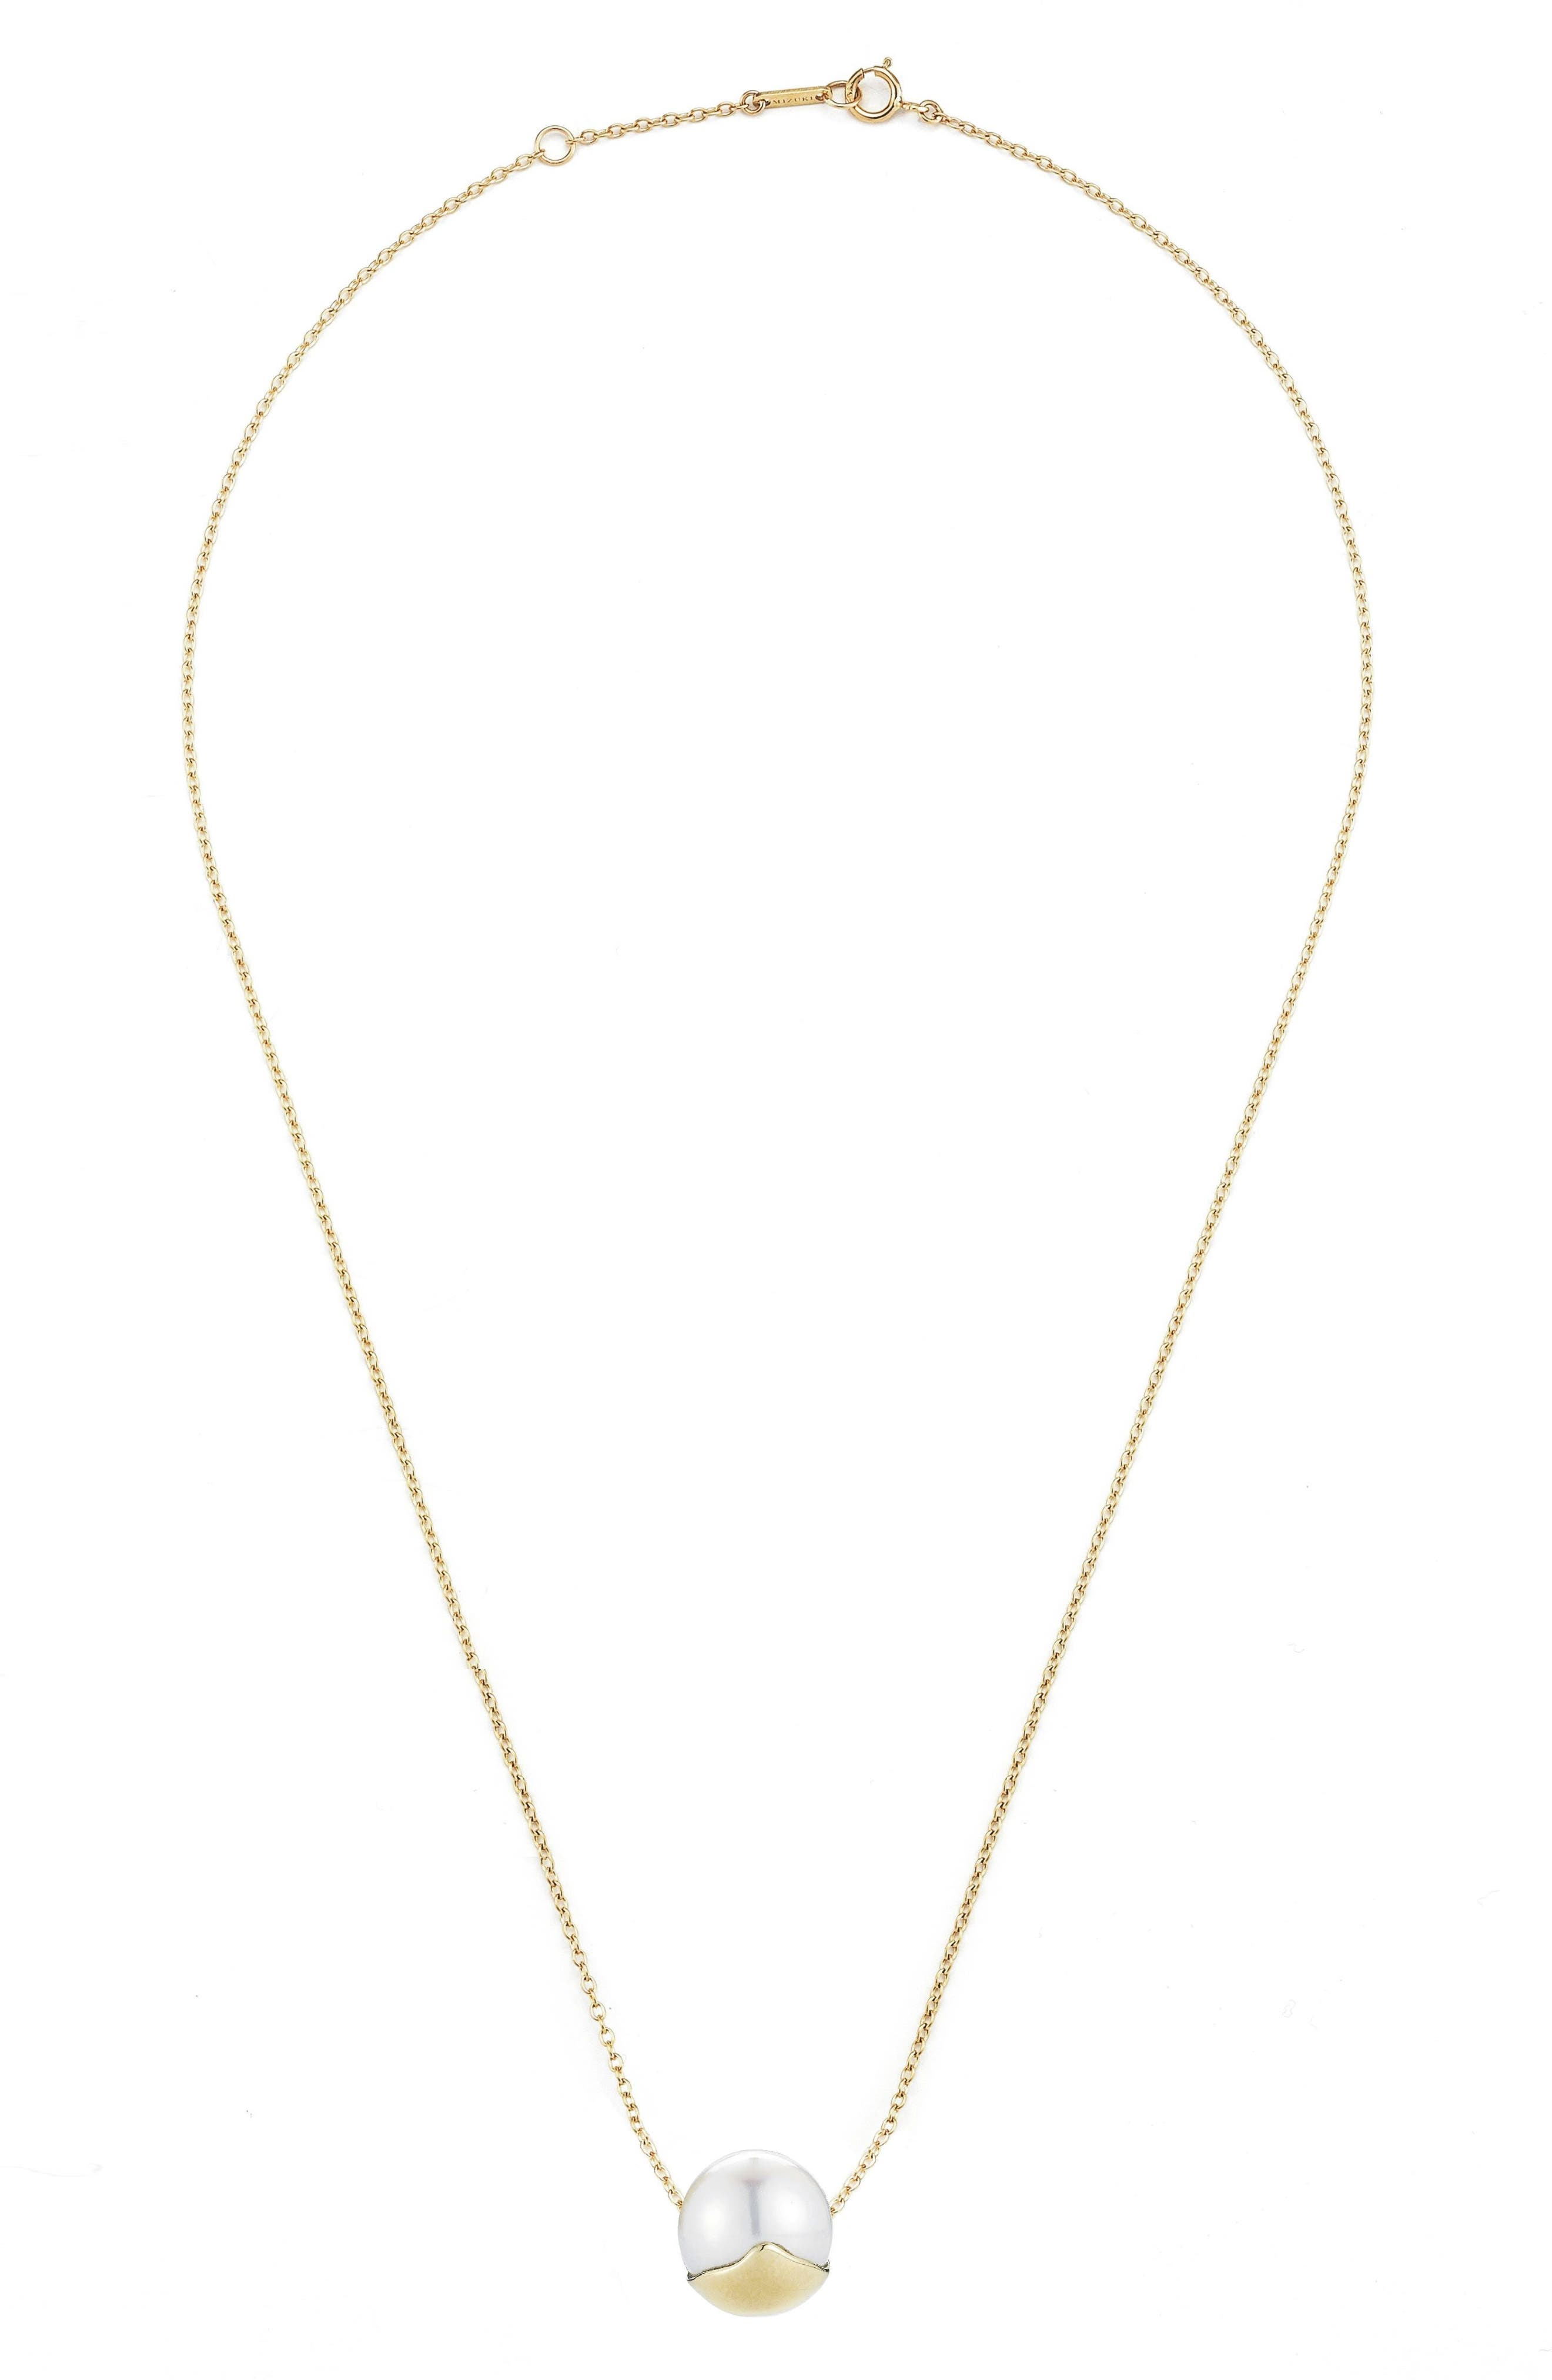 Alternate Image 1 Selected - Mizuki Sea of Beauty Pearl Pendant Necklace